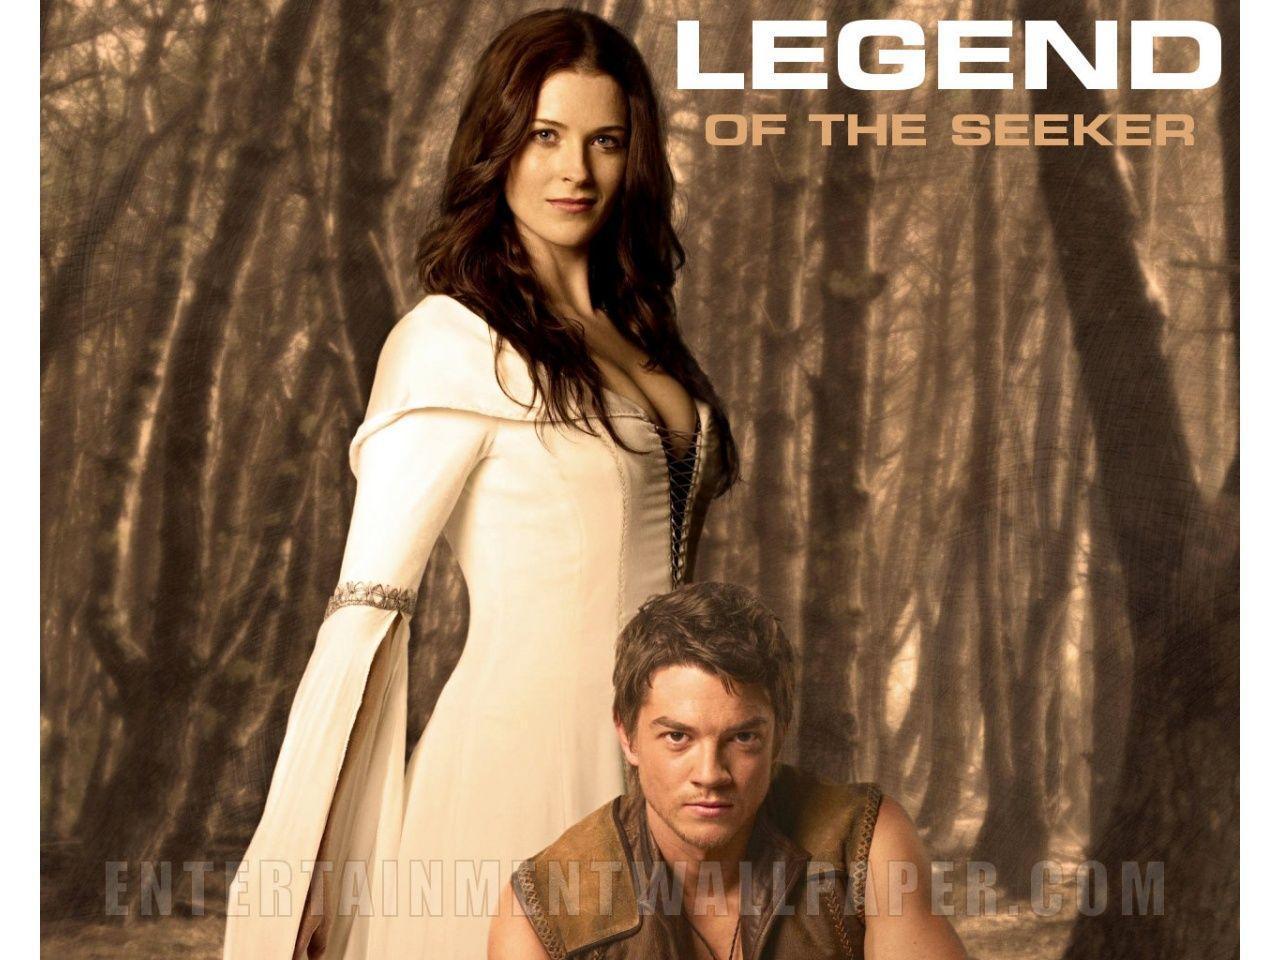 Legend Of The Seeker Wallpapers 1280x960